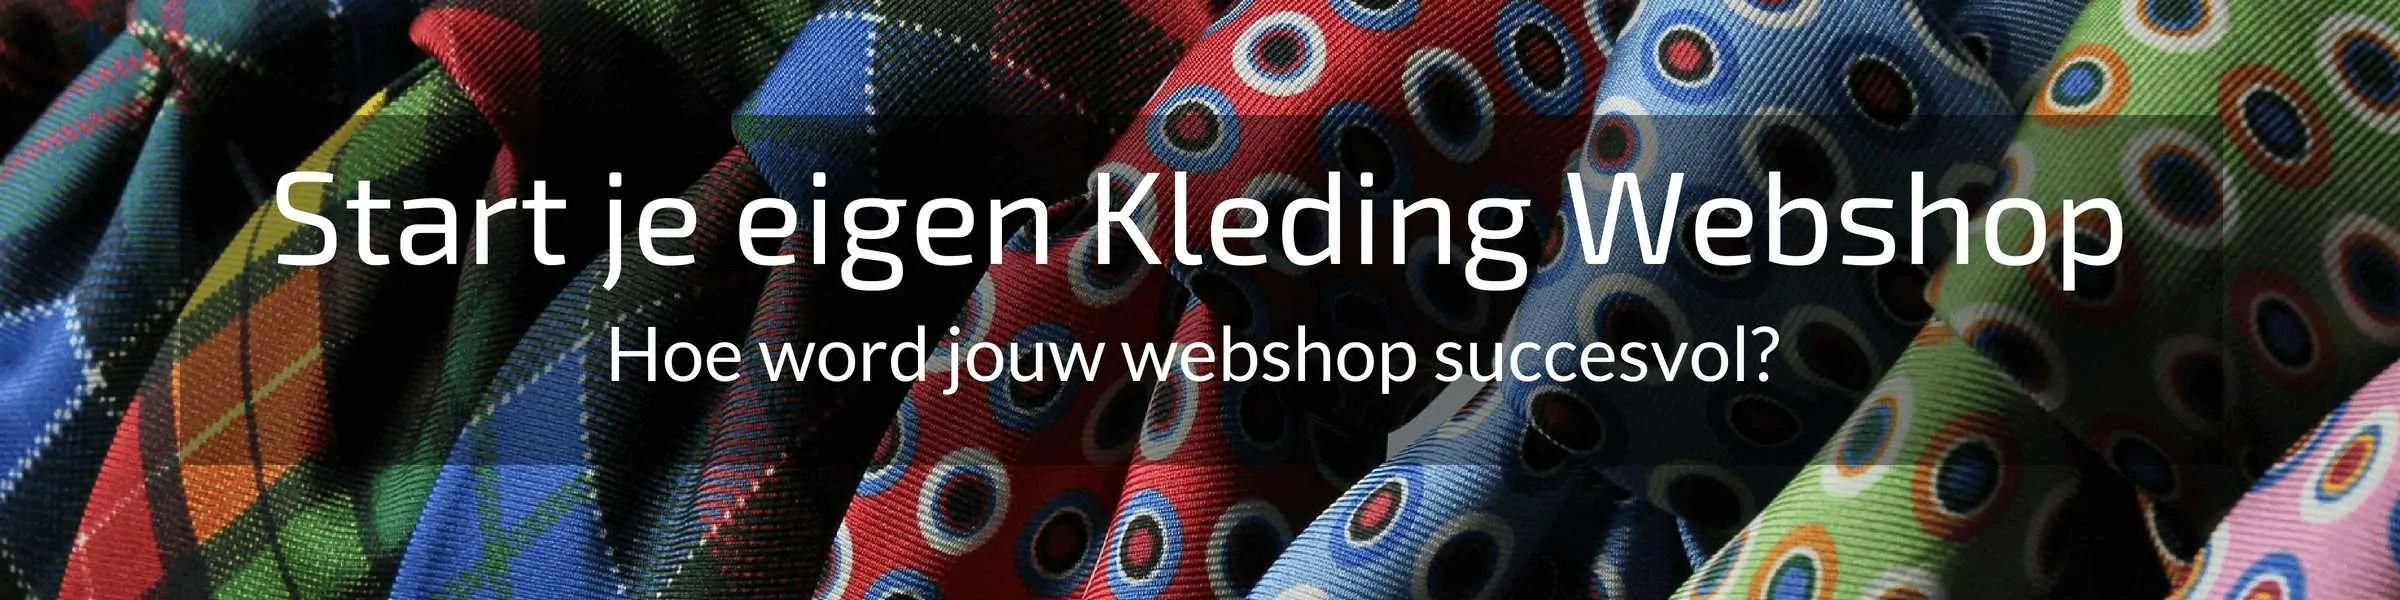 een eigen kleding webshop beginnen